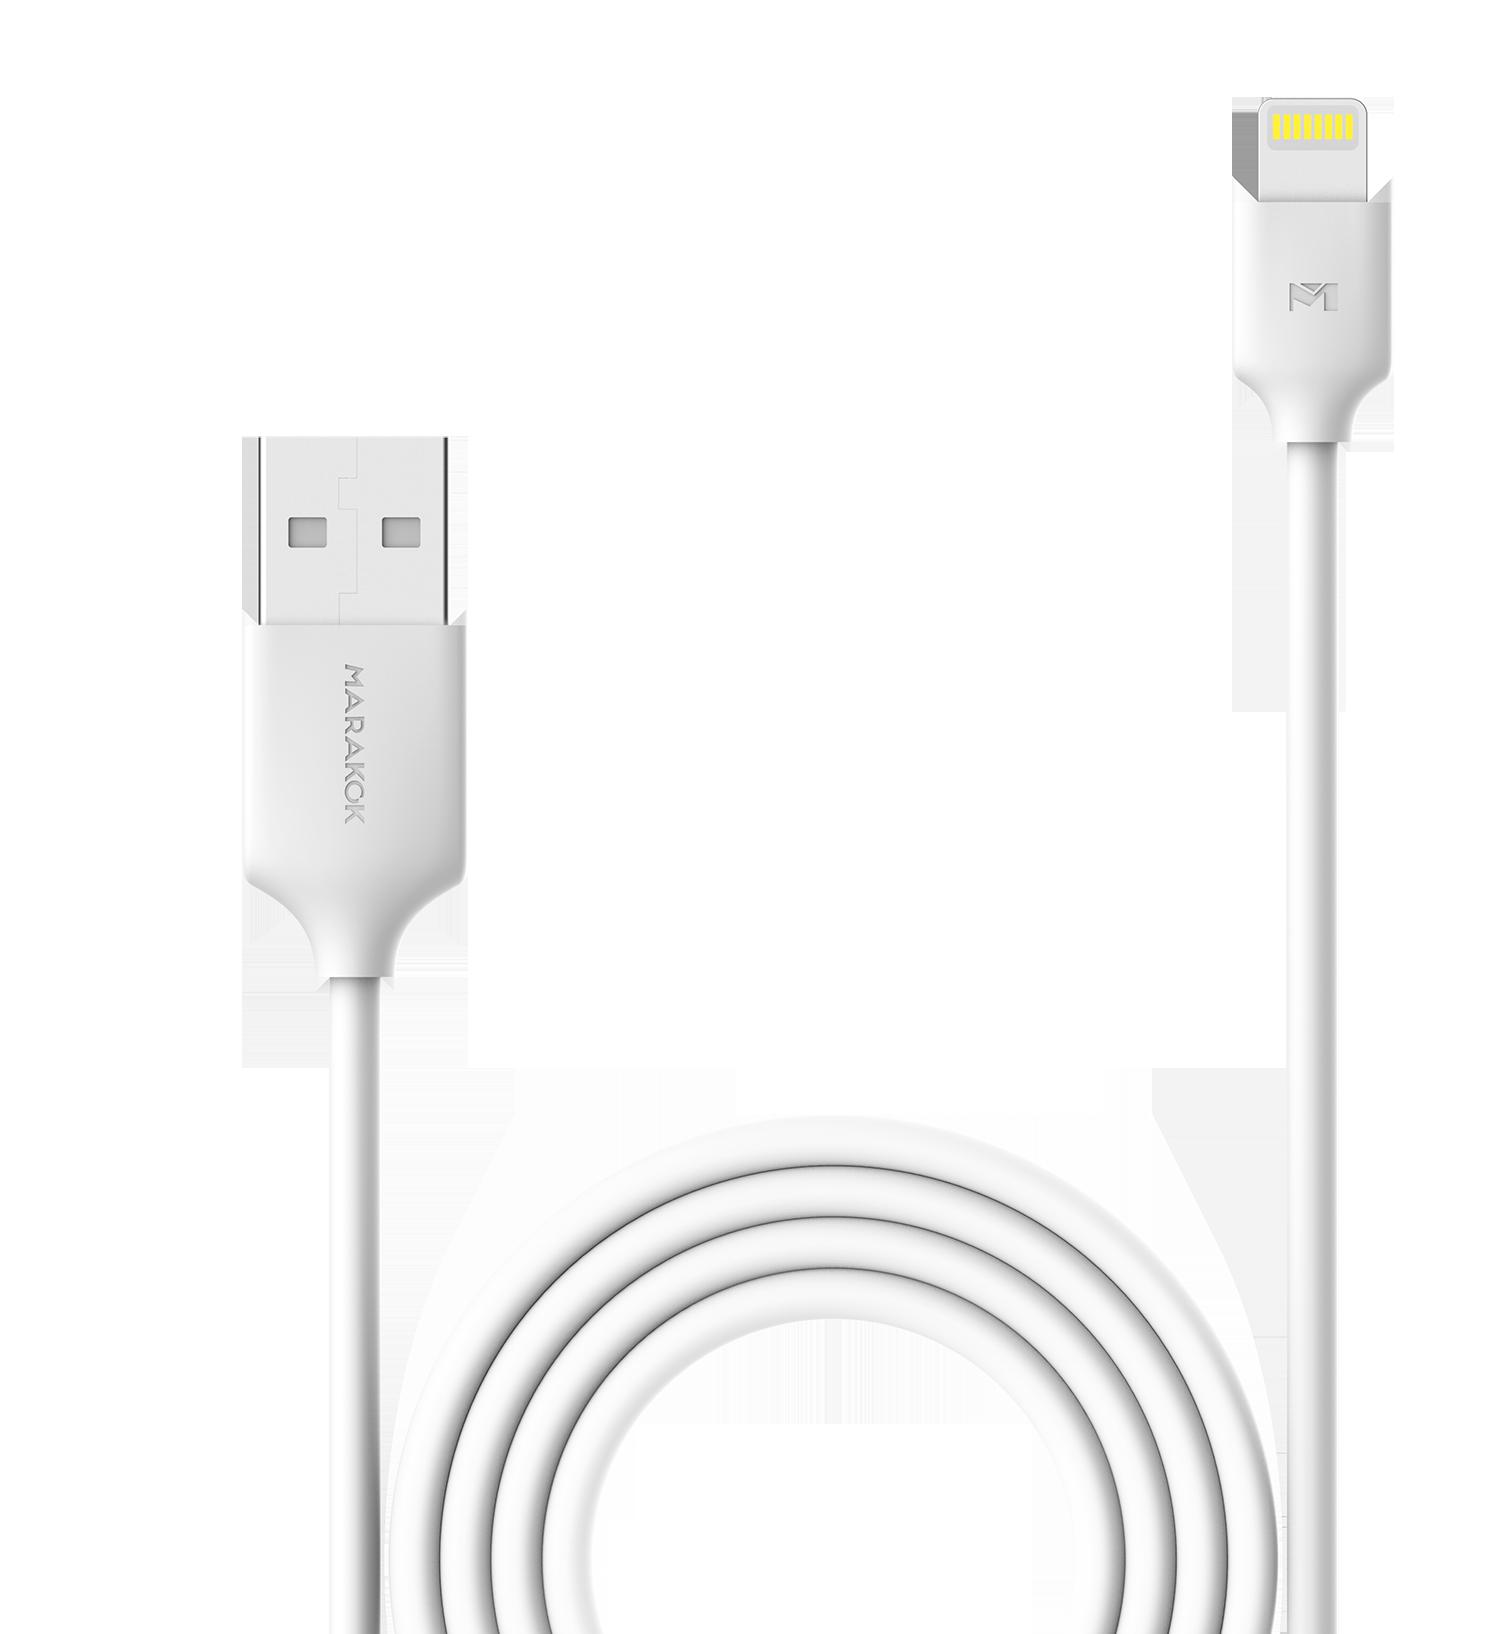 Marakoko MCB6 2M Lightning Cable